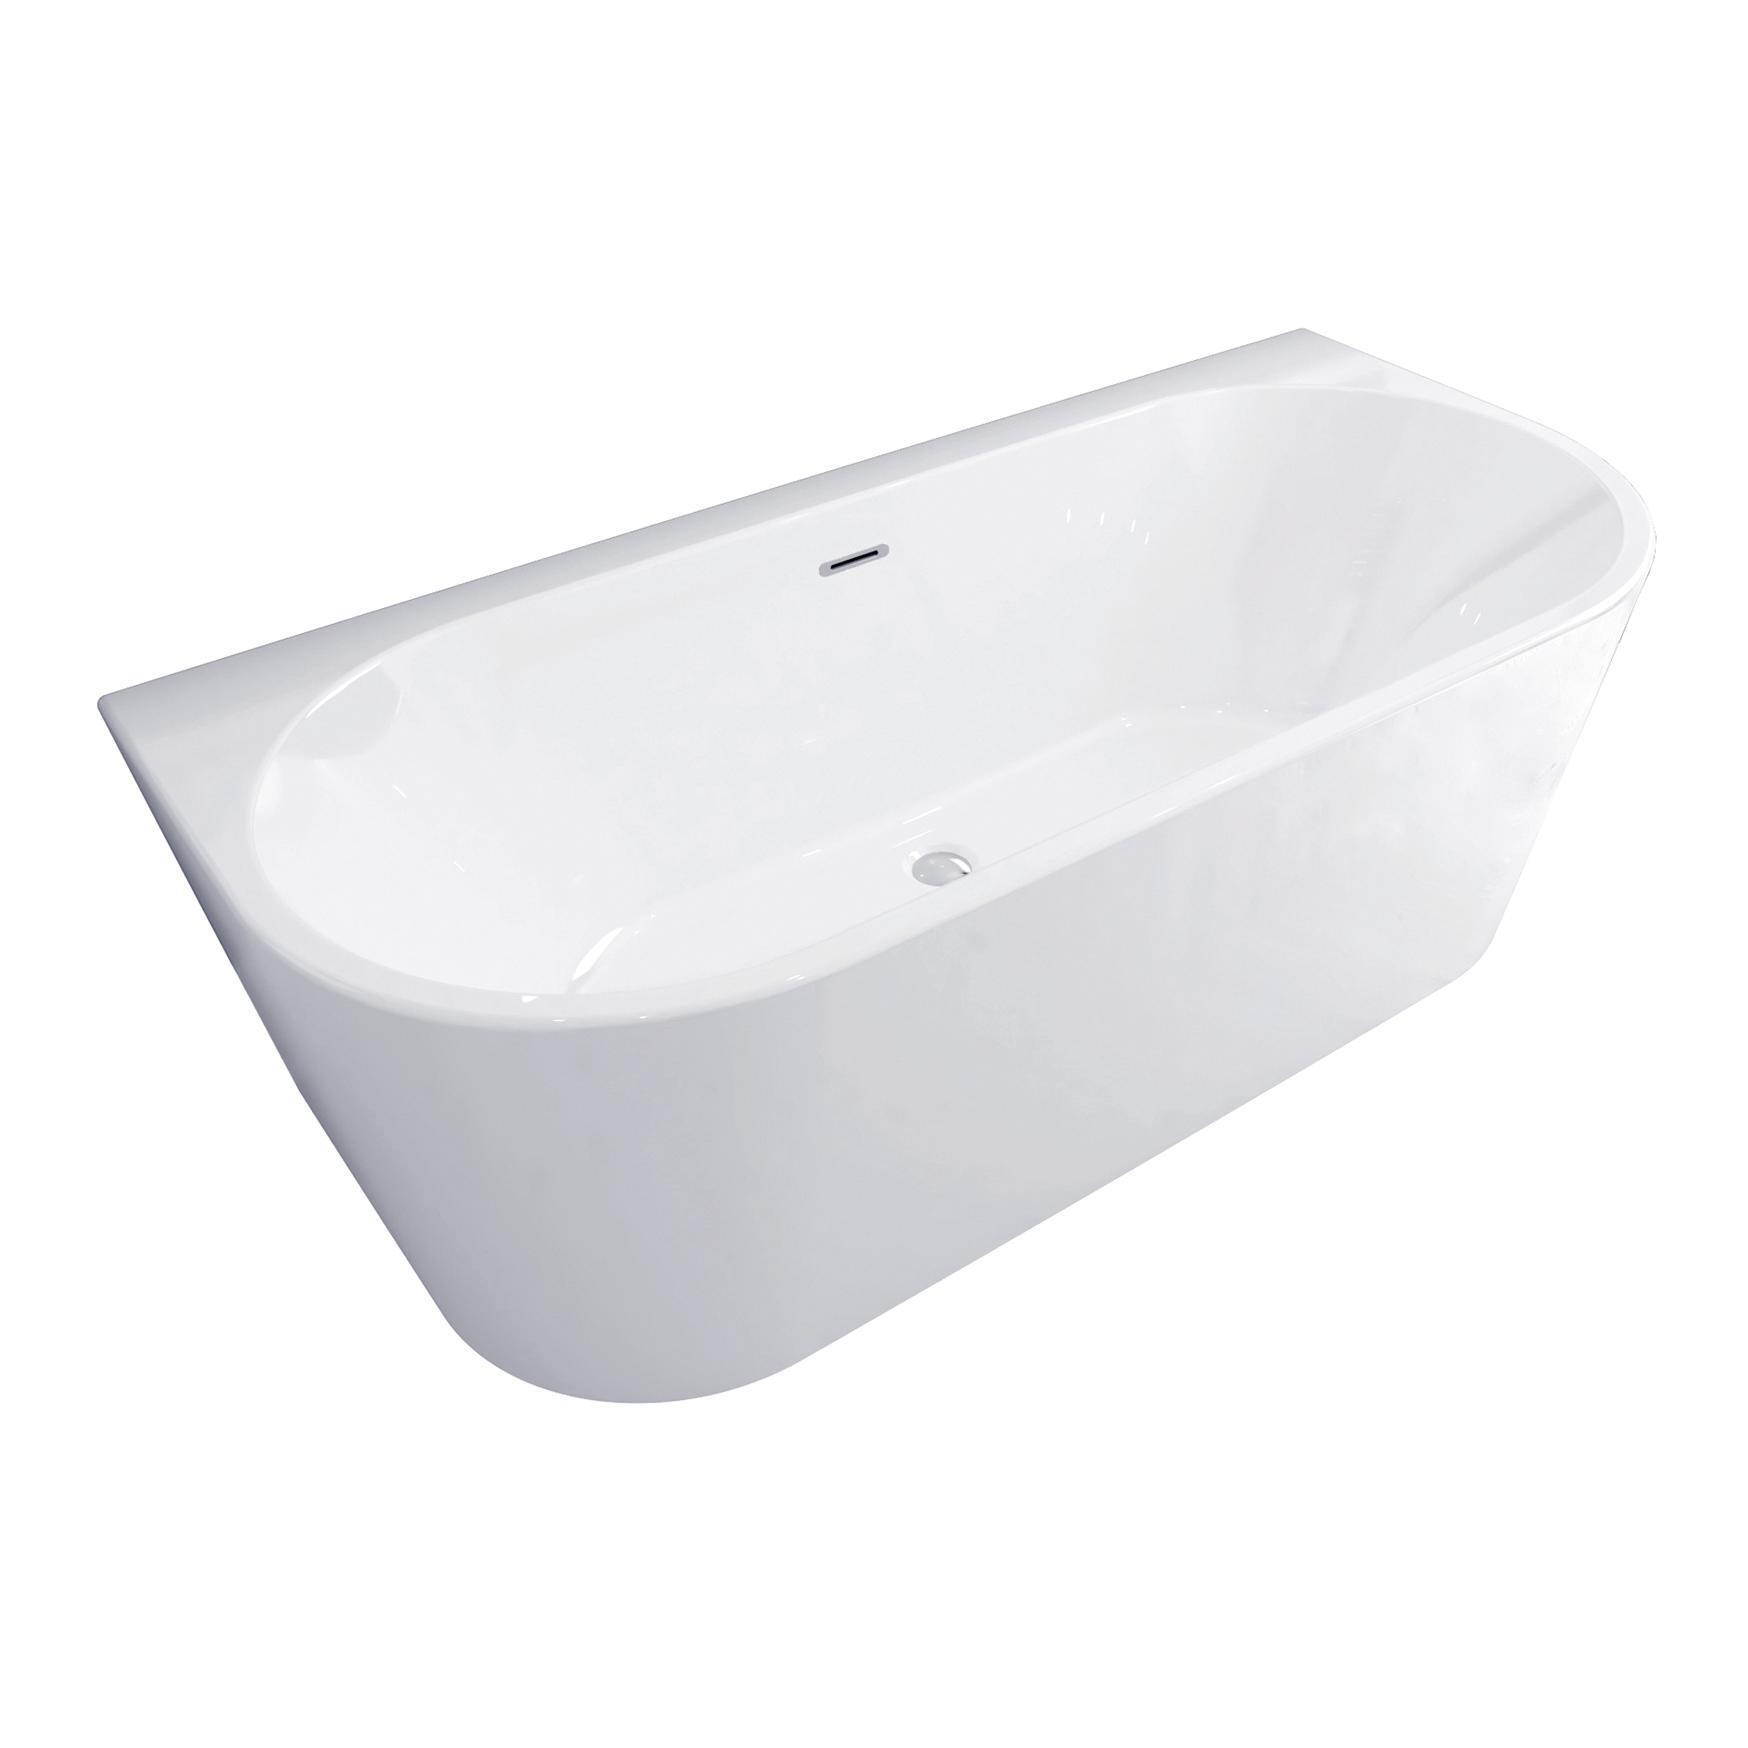 Vasca rettangolare Torino bianco 170 x 80 cm SANYCCES - 3